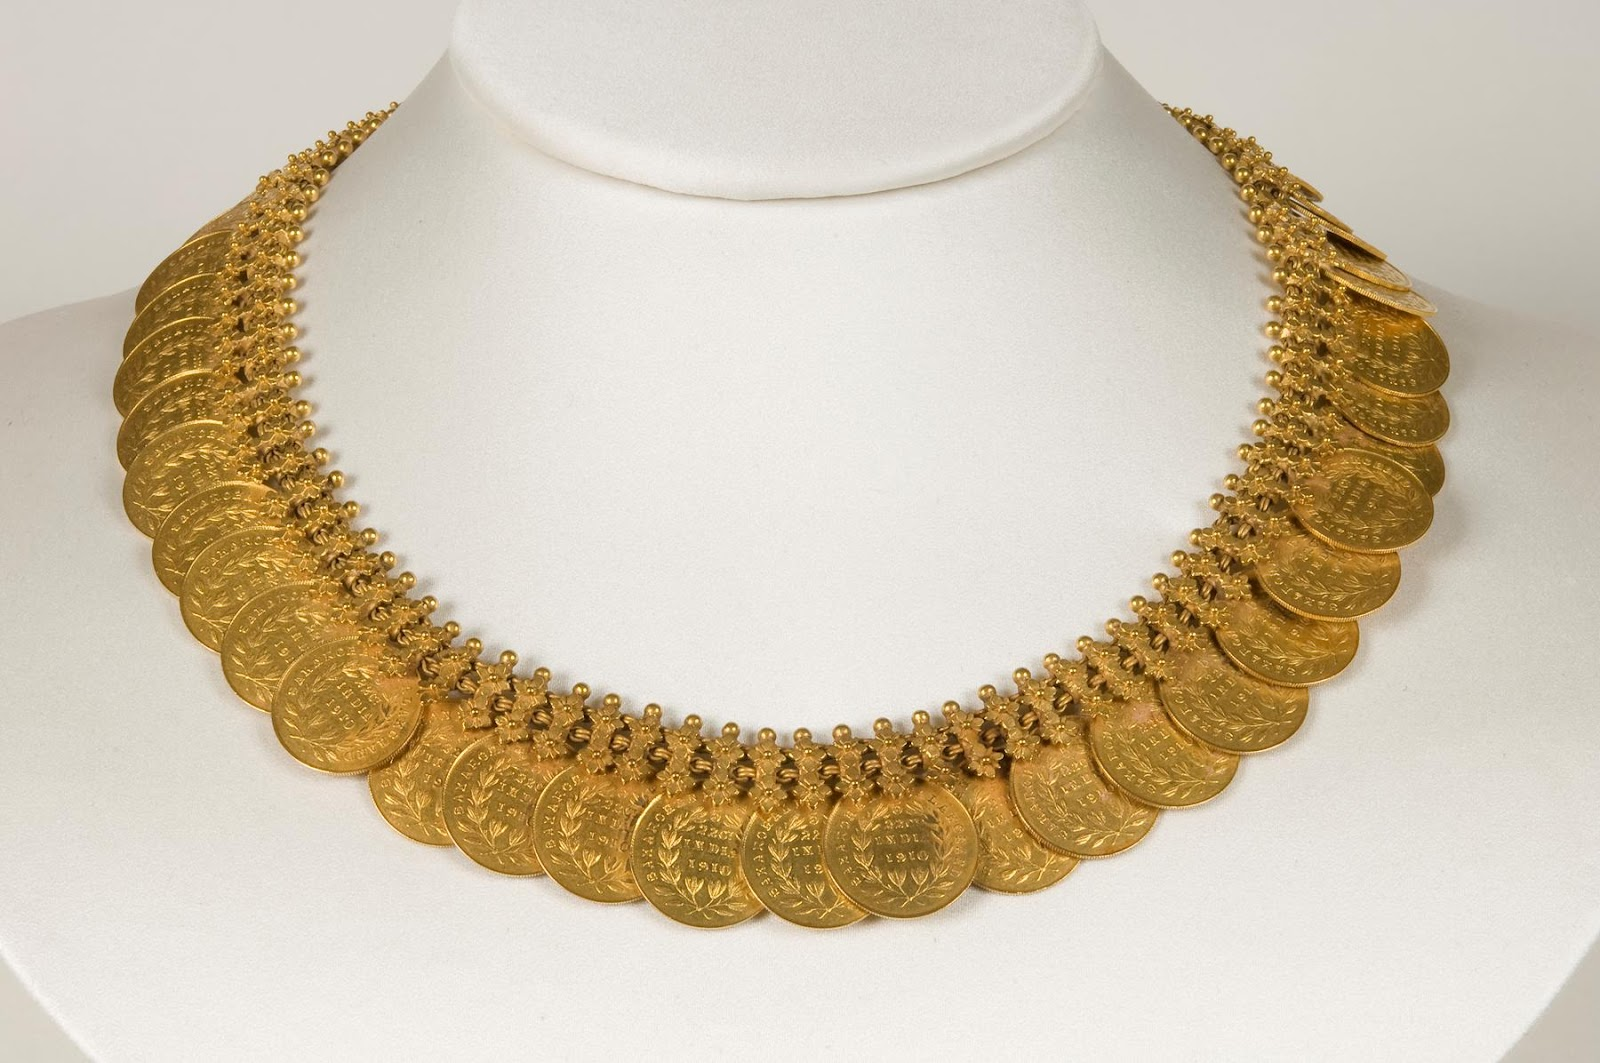 Pai jewellers gold necklace designs latest indian jewellery designs - Latest Designs Of Kasumala Or Kasulaperu